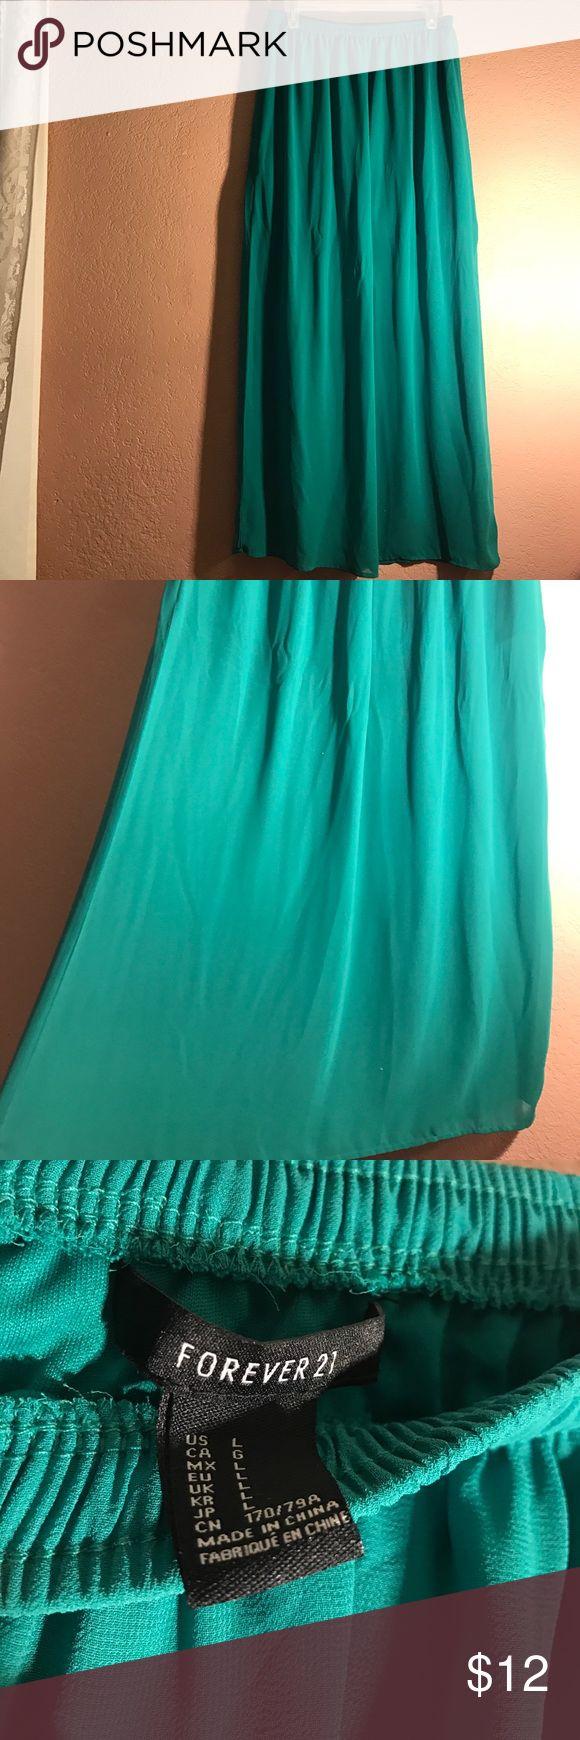 Turquoise Maxi Skirt Forever 21 Turquoise Maxi Skirt, size Large. Forever 21 Skirts Maxi